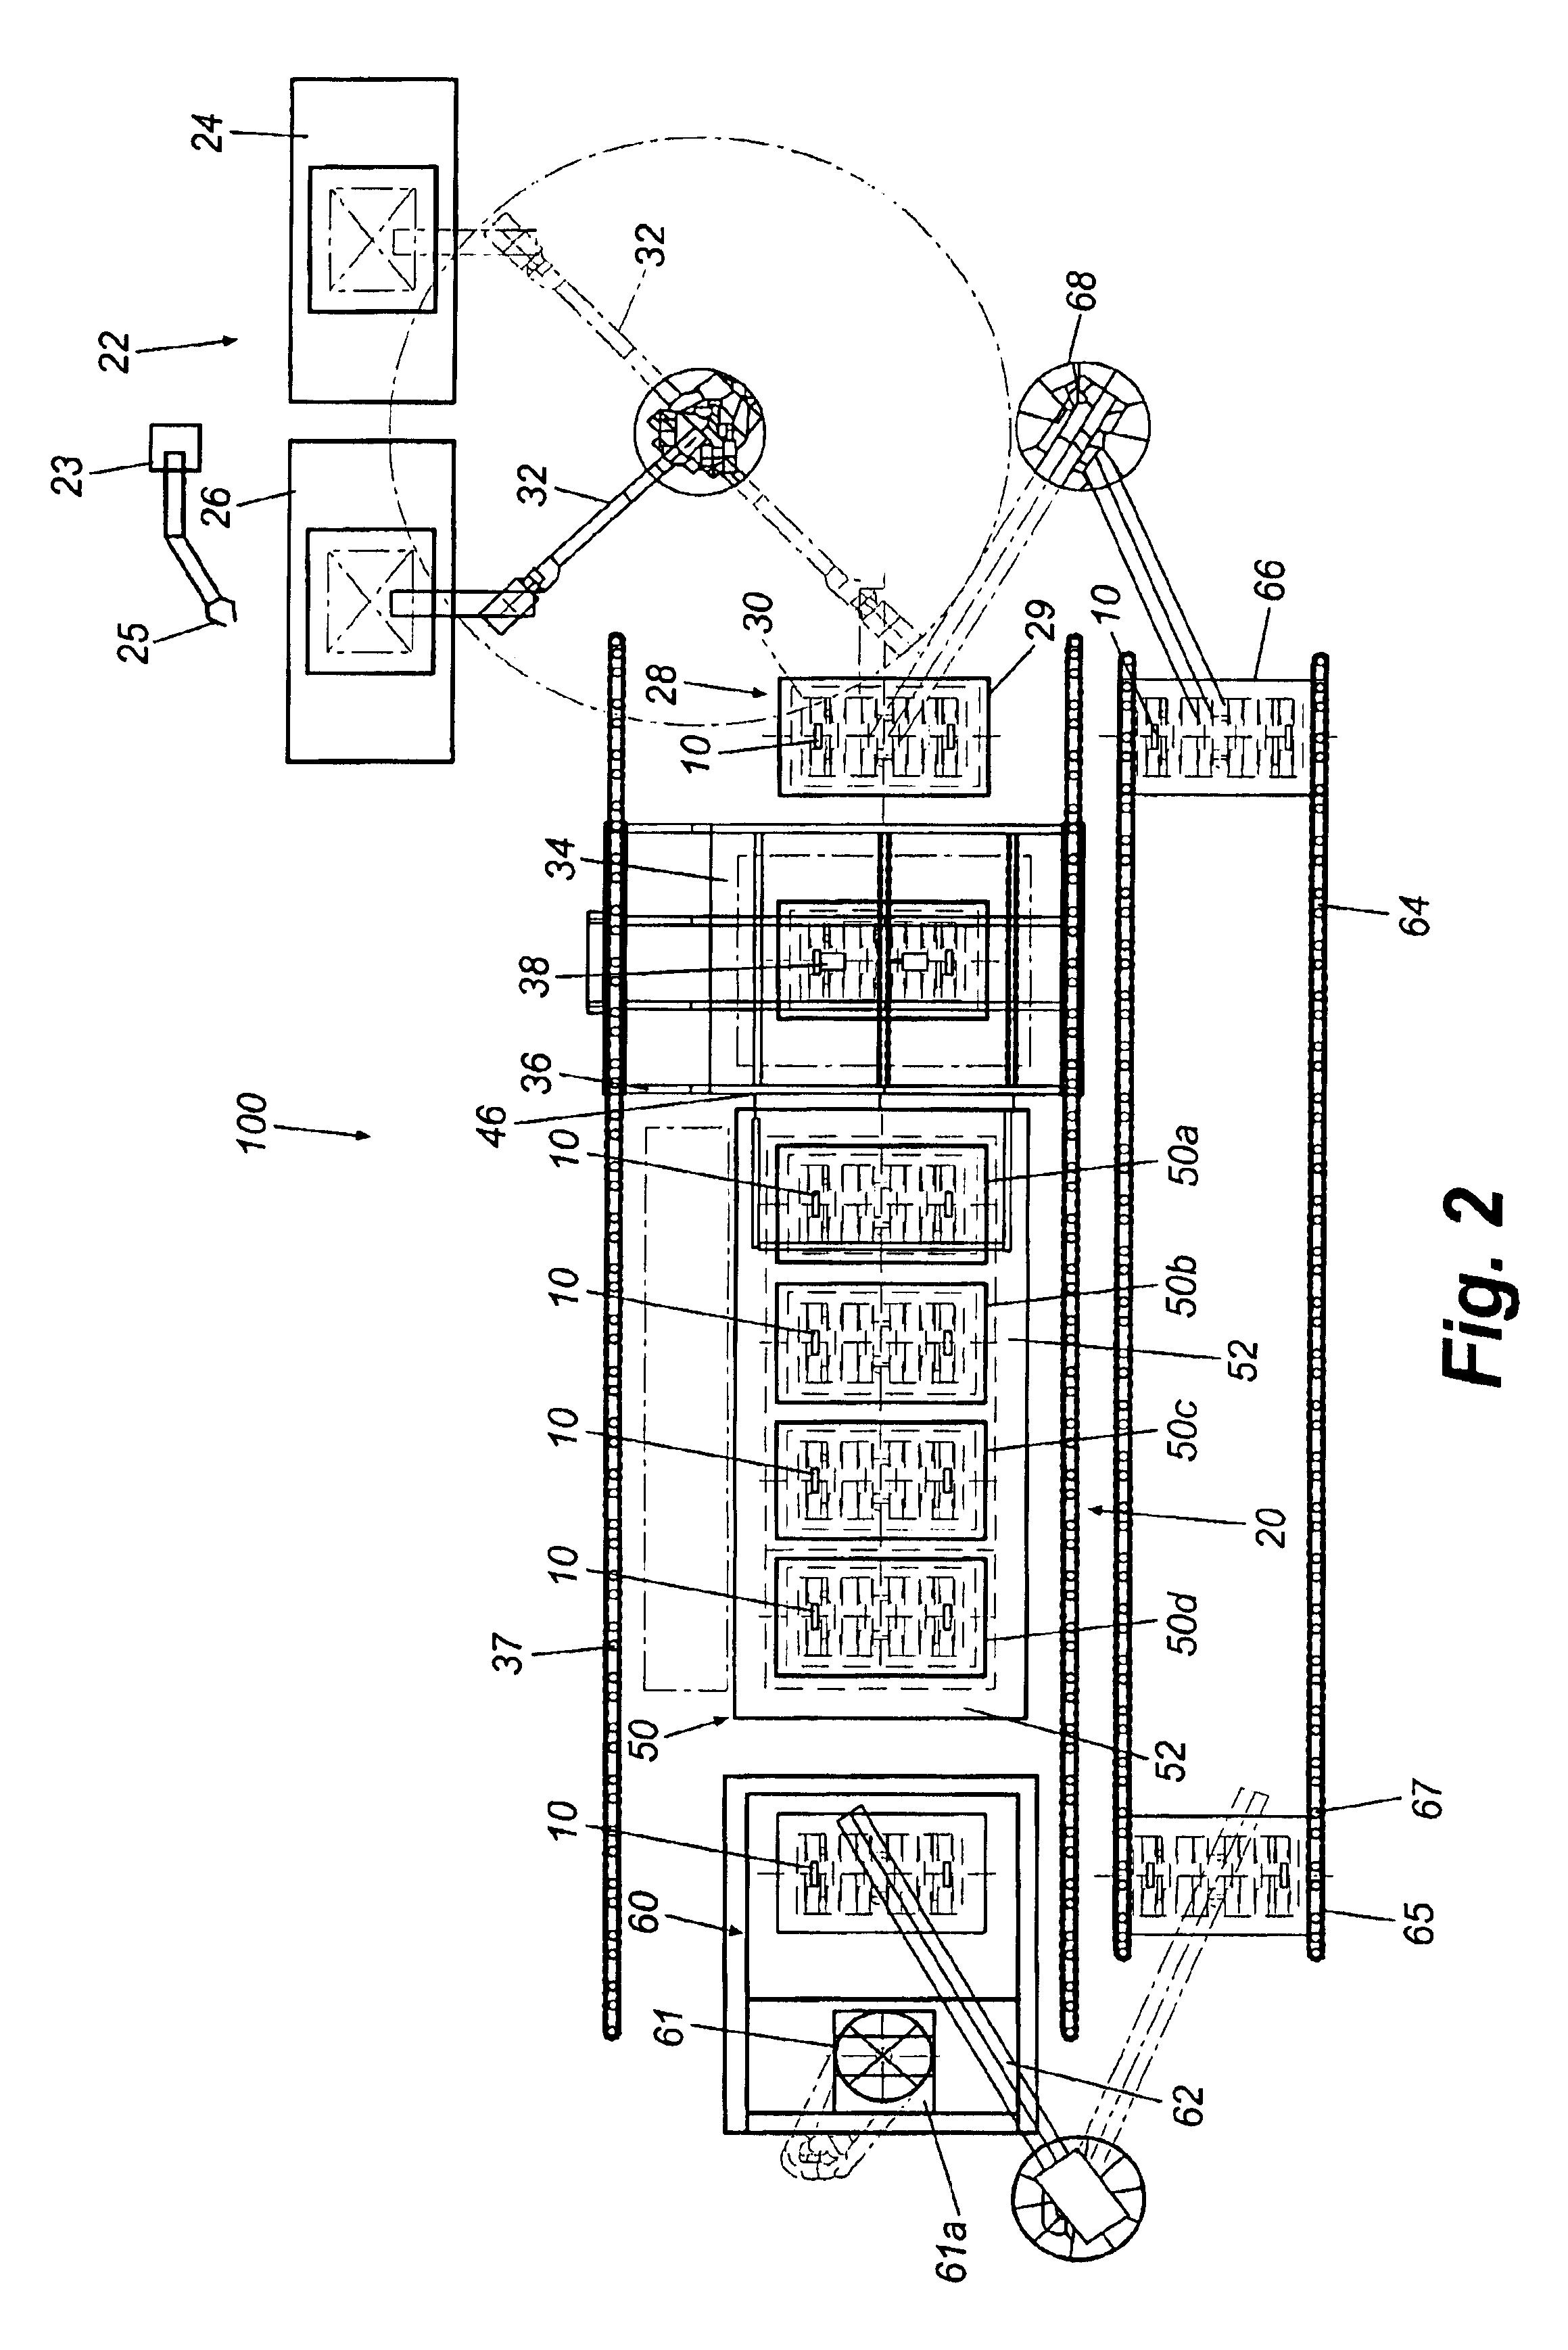 2014 maycar wiring diagram page 4 wiring diagram schematics rh 2 oiienoxj phototek de